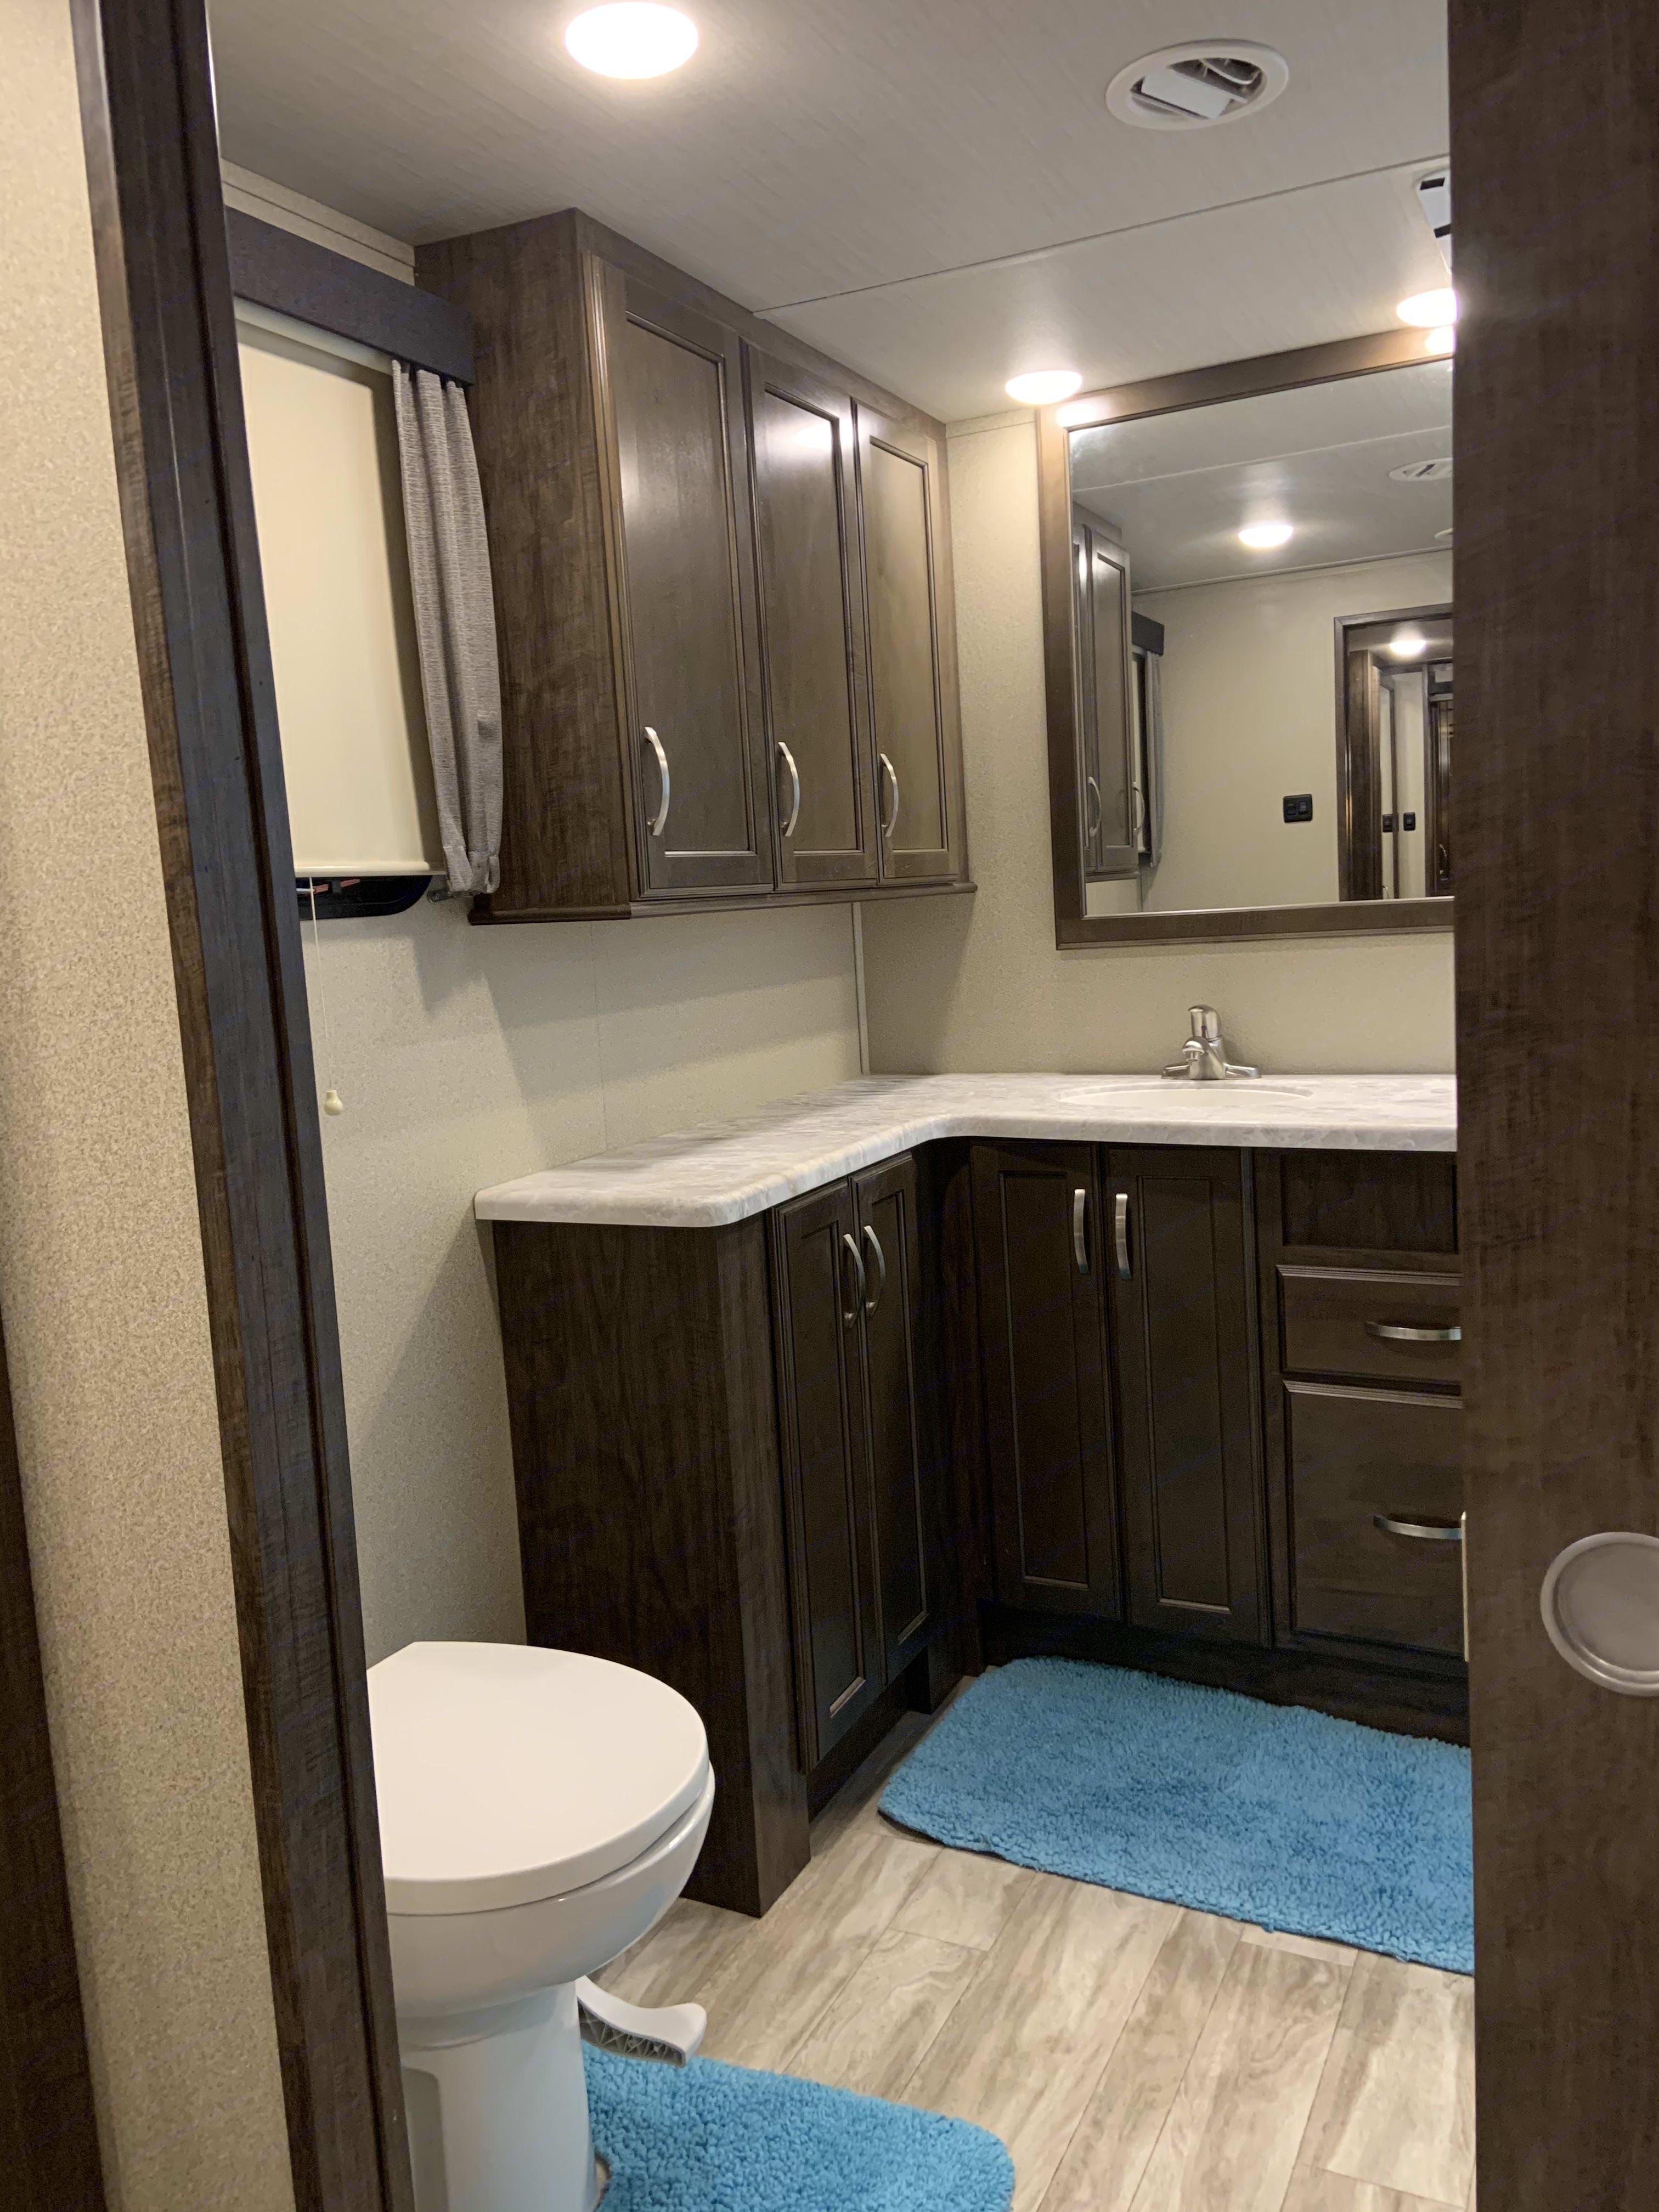 Main bathroom. Grand Design Solitude 2019